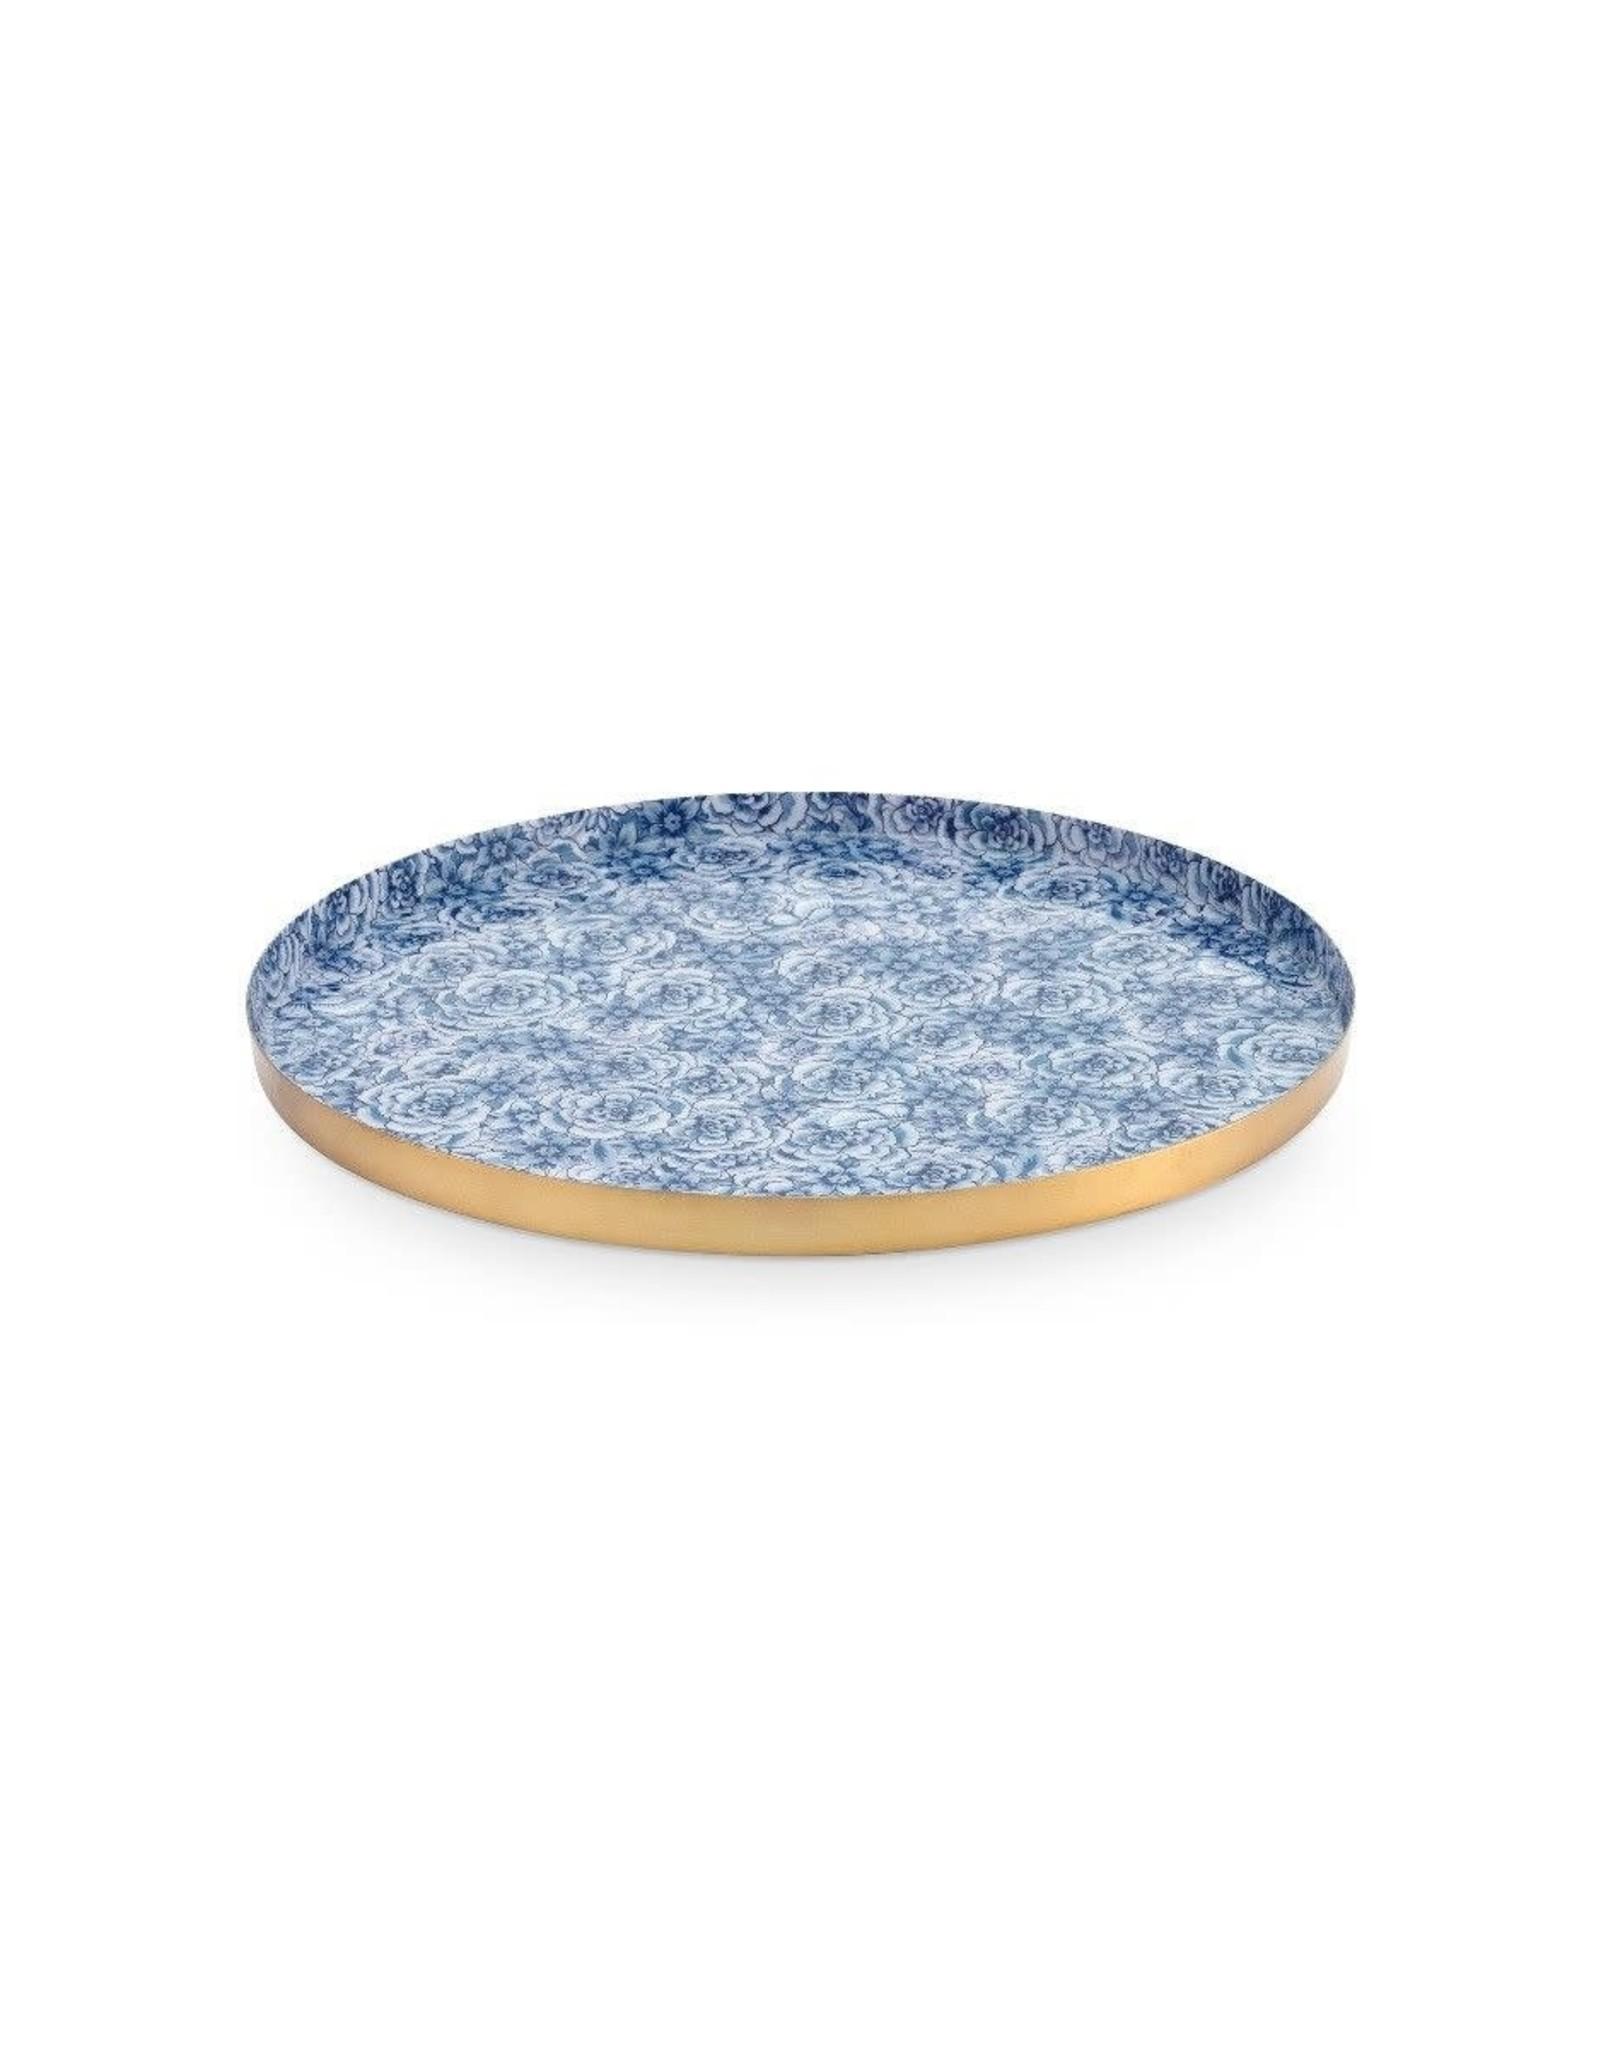 pip-studio Pip studio. Royal metalen bord blauw 29.5 cm